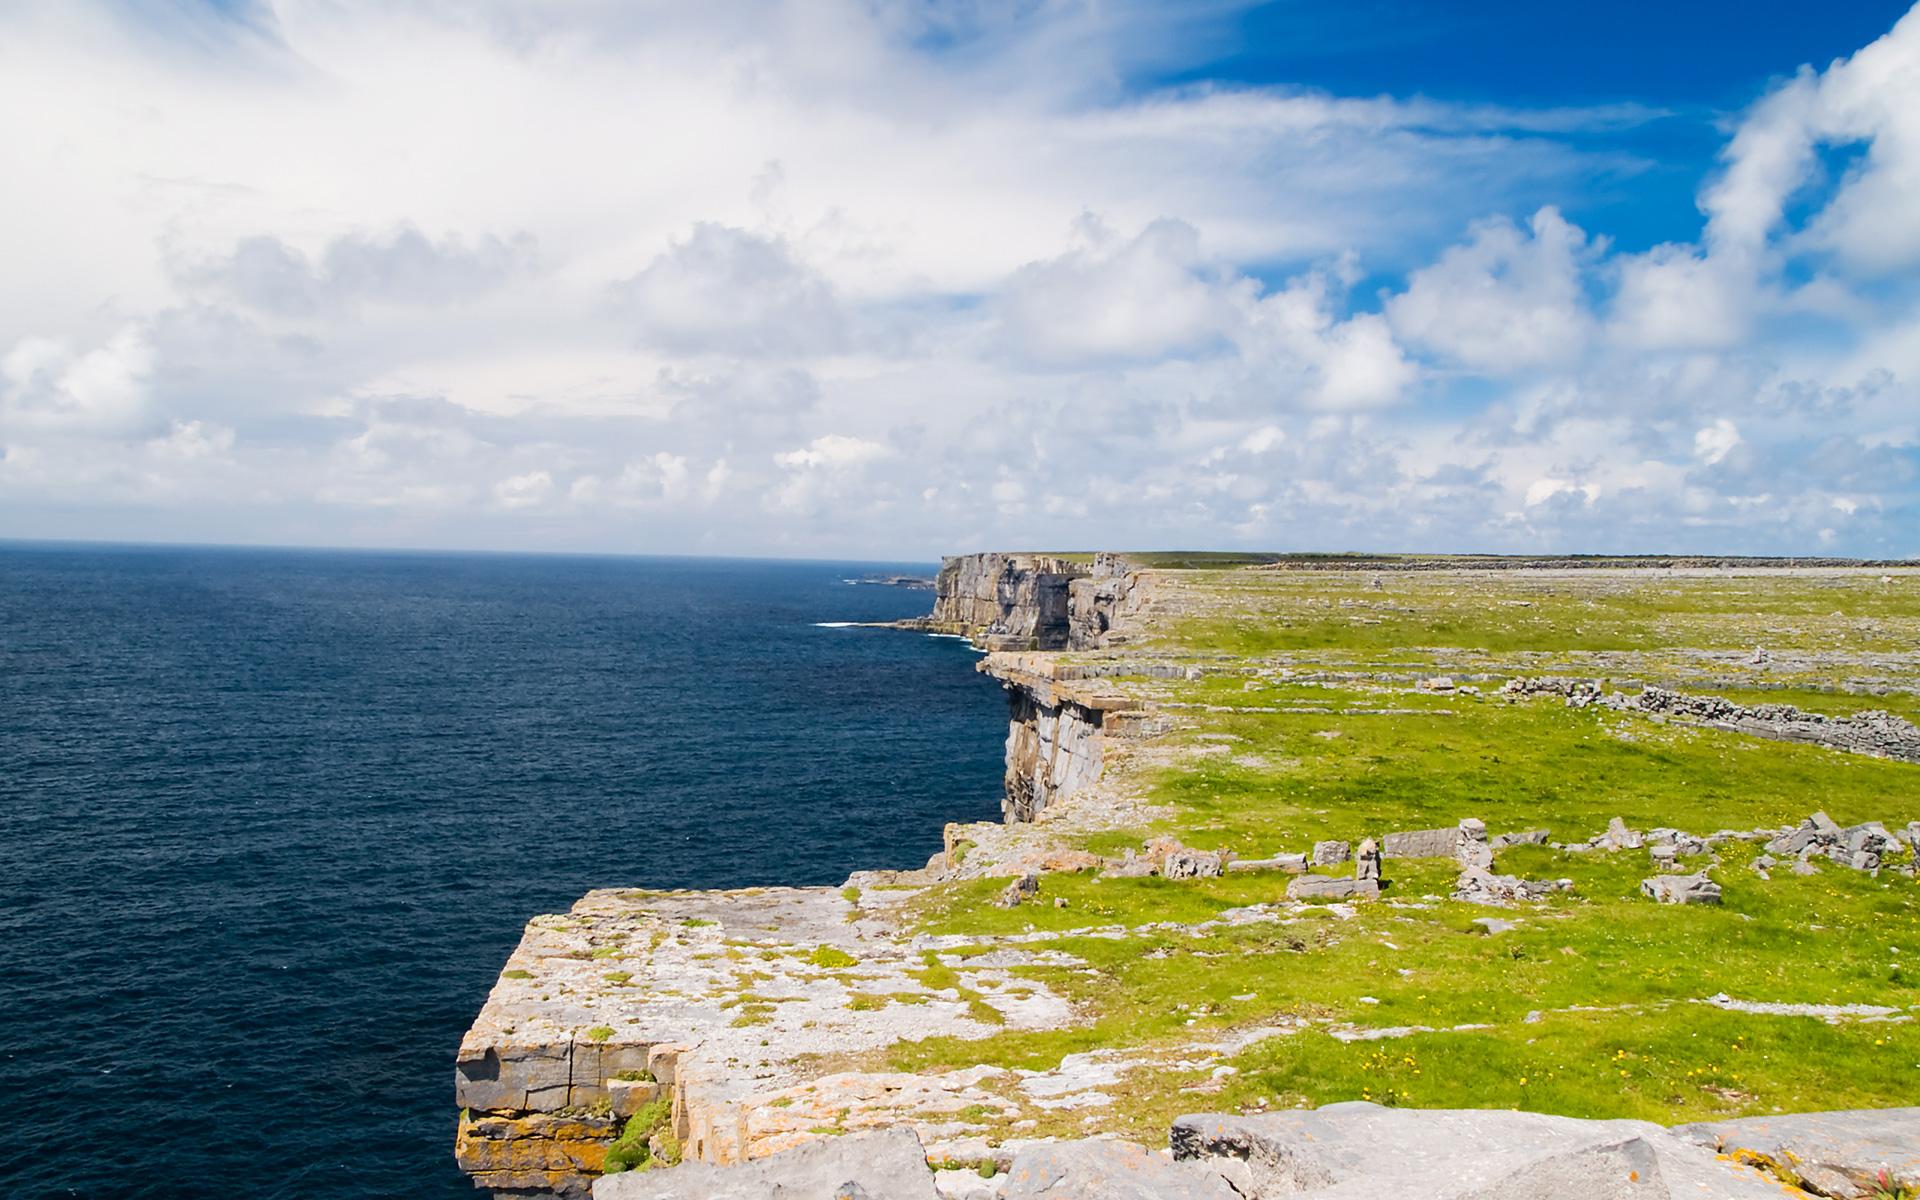 Sea Cliff Wallpaper Sea Cliff Wallpaper ...